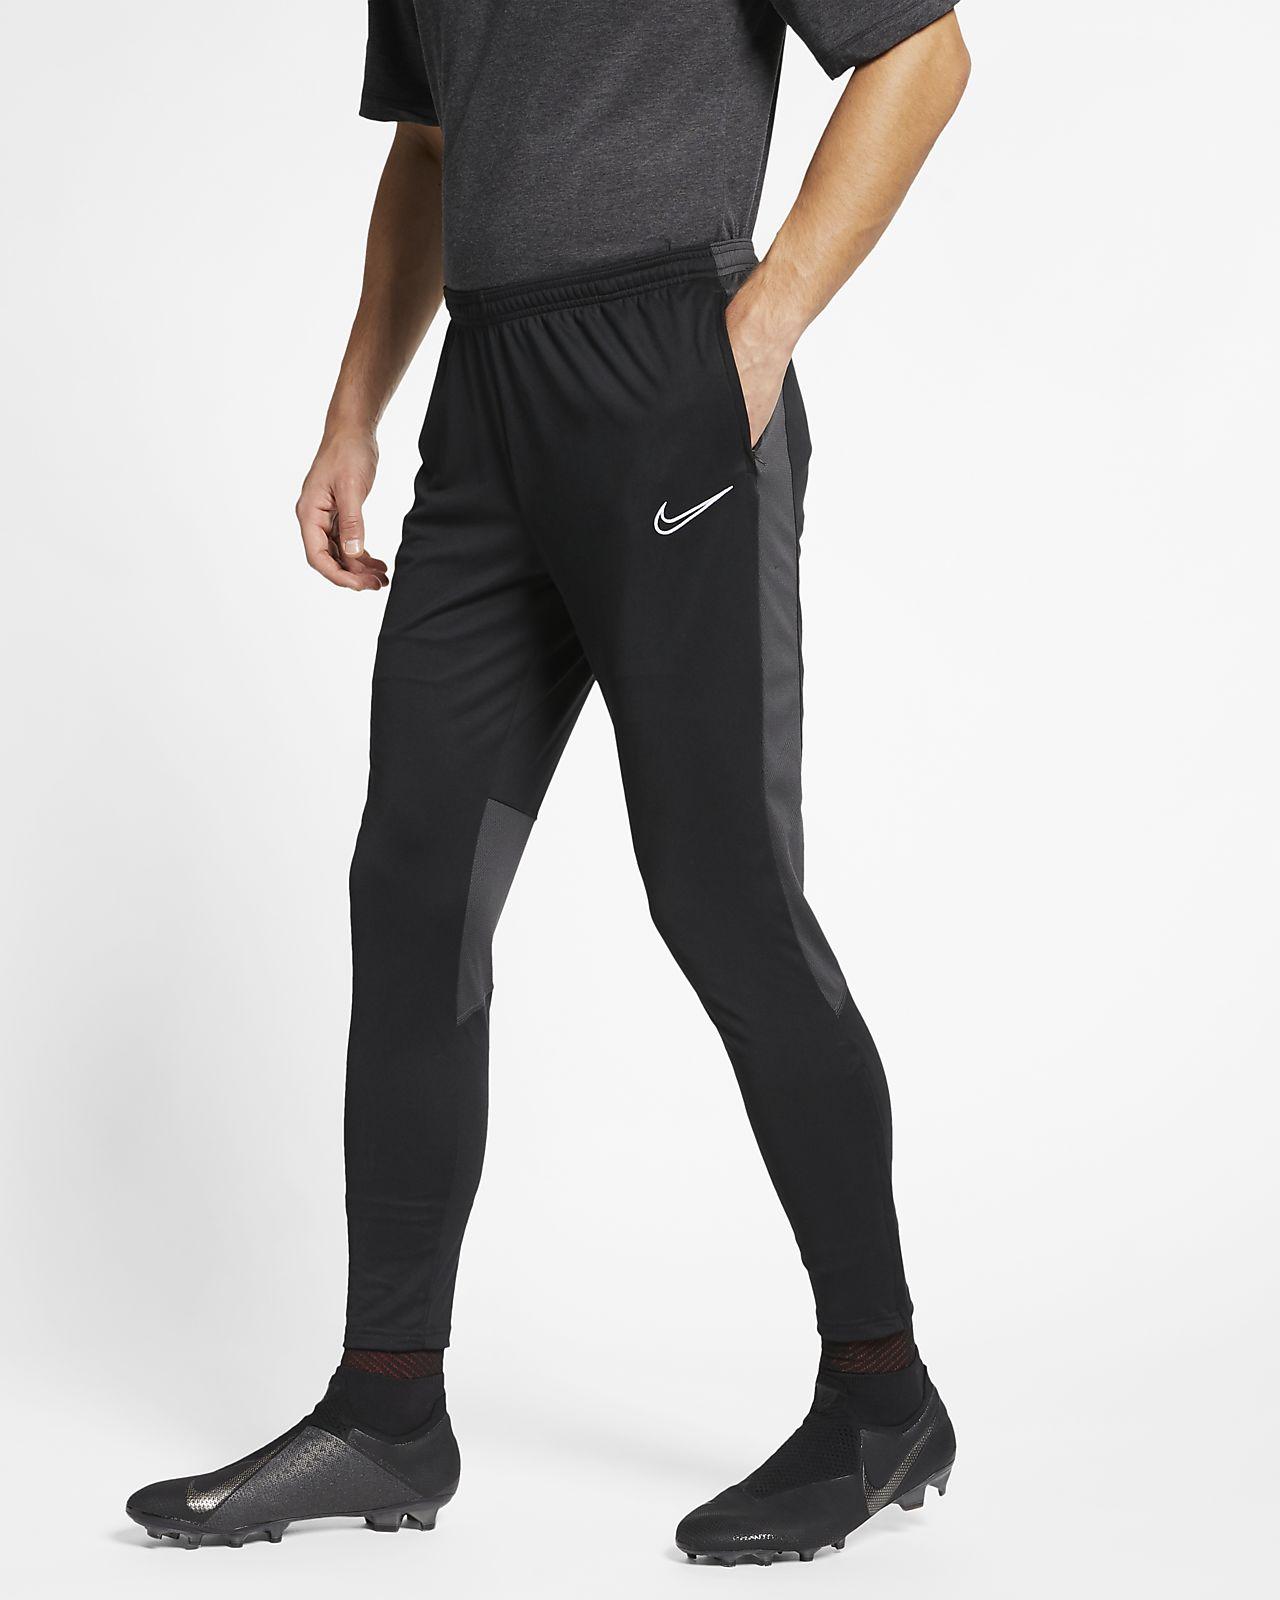 new style cc1ef 866e8 ... Nike Dri-FIT Academy Men s Football Pants